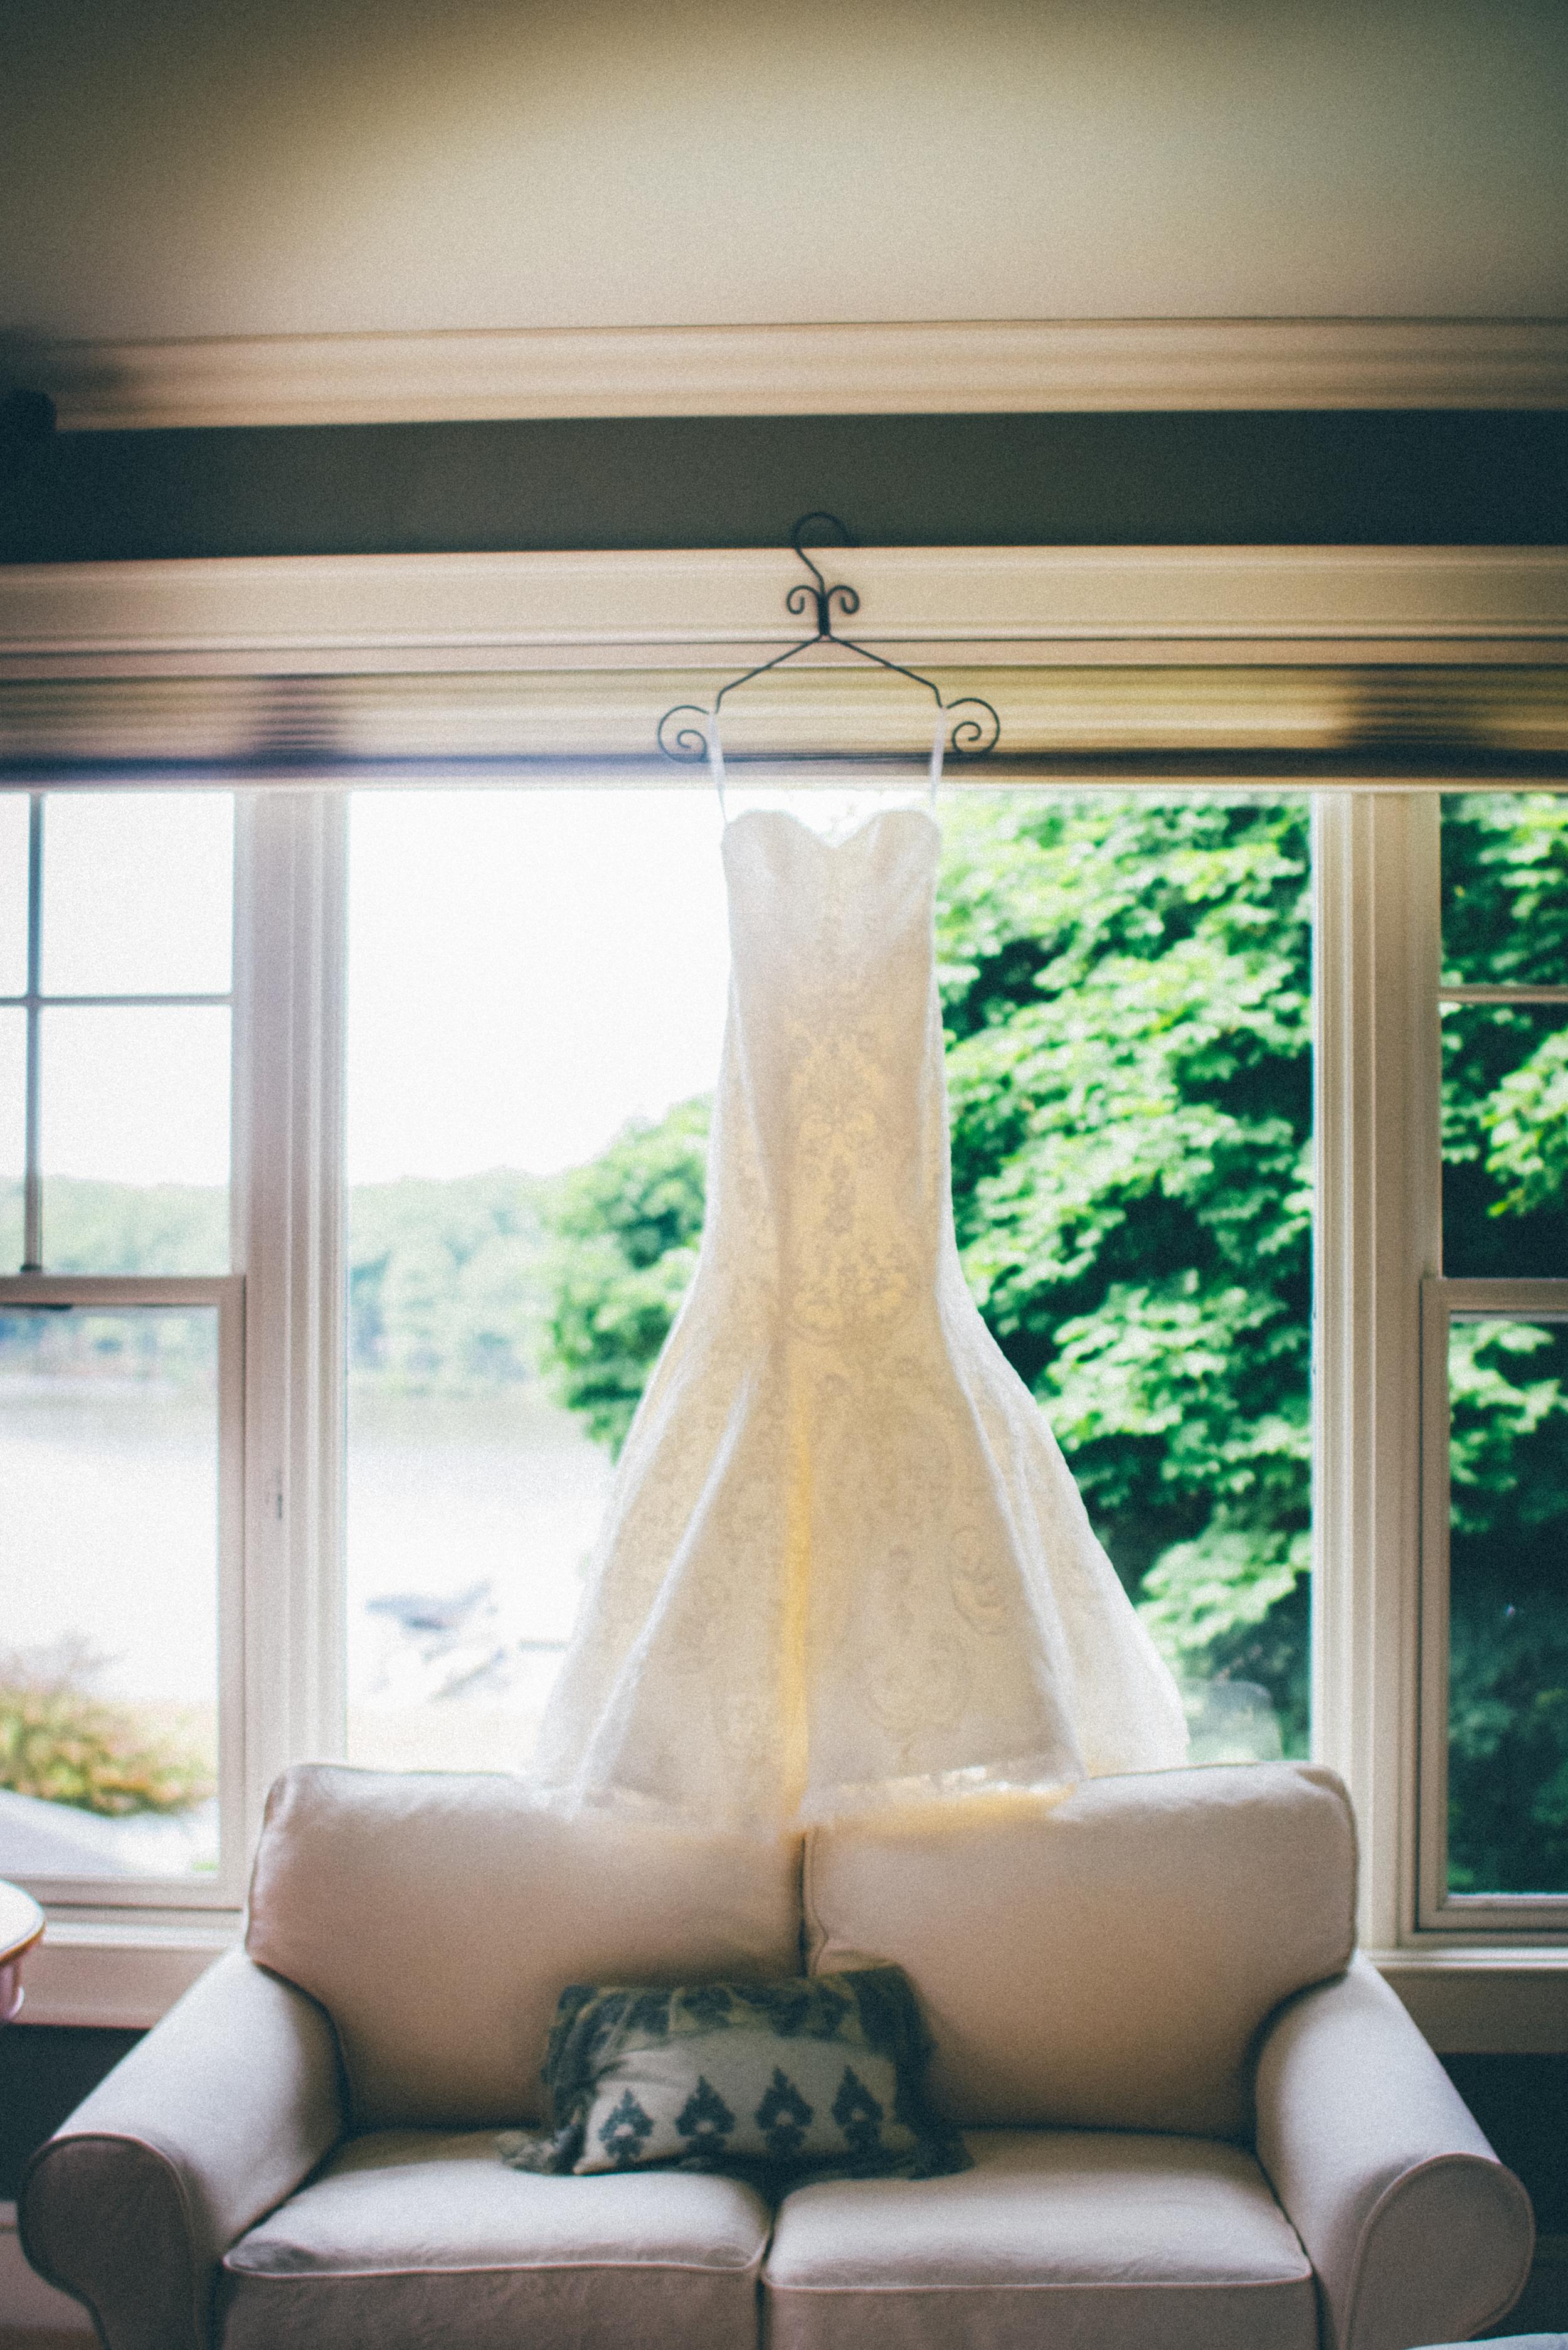 Grand-Rapids-Michigan-Wedding-Photographers-Videographers-Shadow-Shine-Pictures-Josh-Cassie-Teigen-Schoonmaker-002